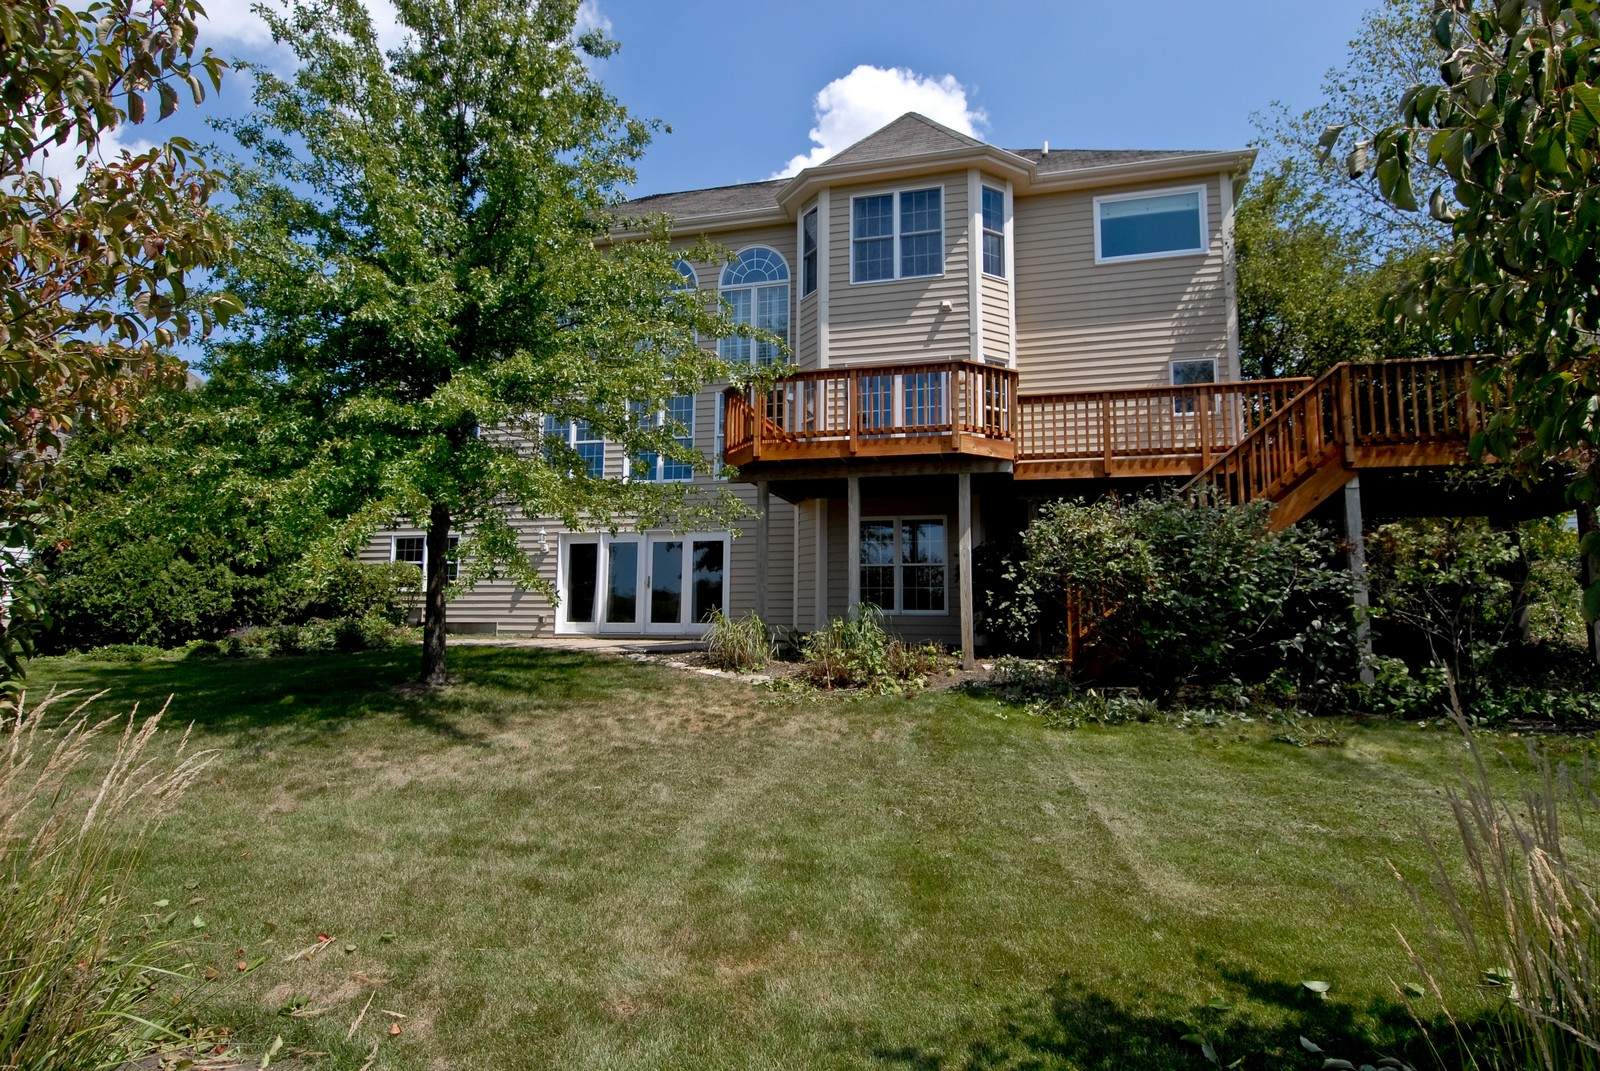 Real Estate Photography - 1264 Keim Ct, Geneva, IL, 60134 - Rear View